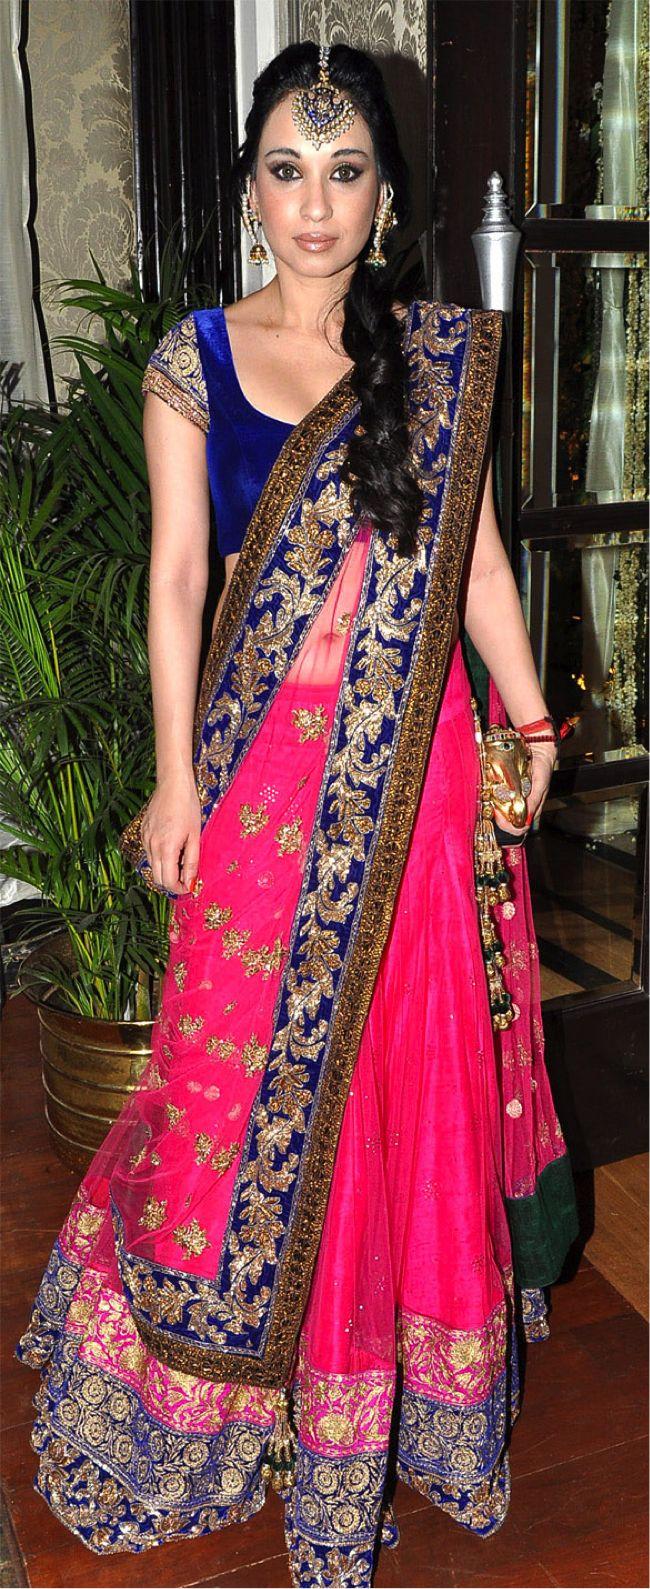 // for indian wedding, festival